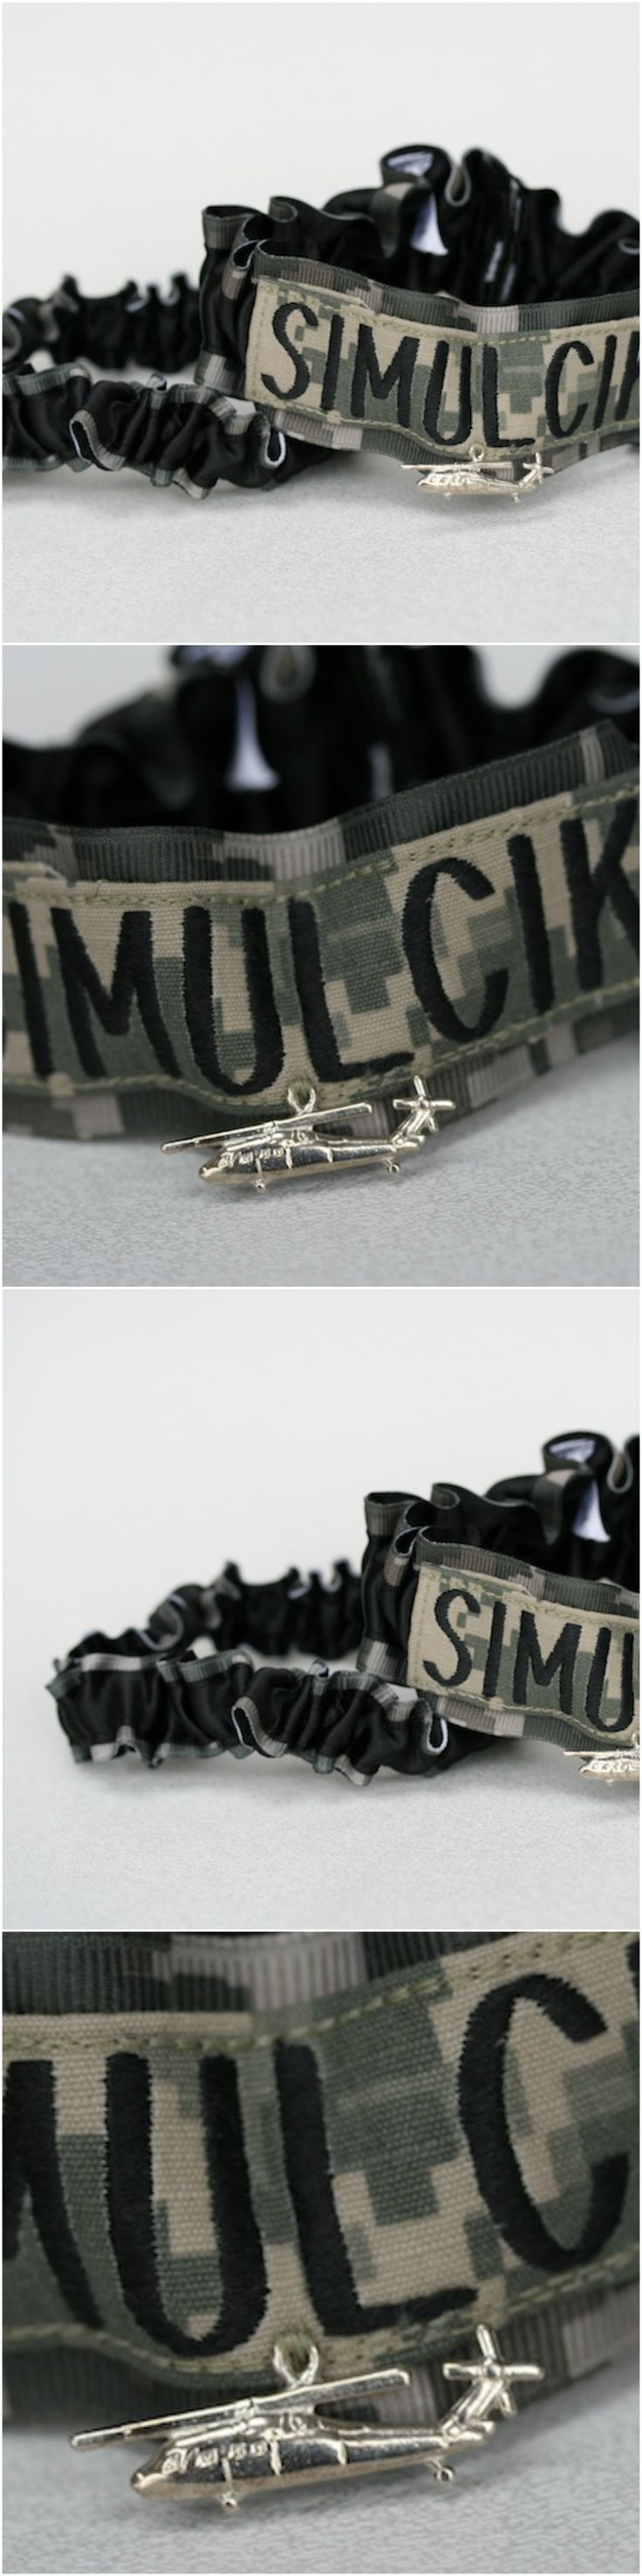 Custom Camouflage and Military Name Tape Wedding Garter Set-by The Garter Girl